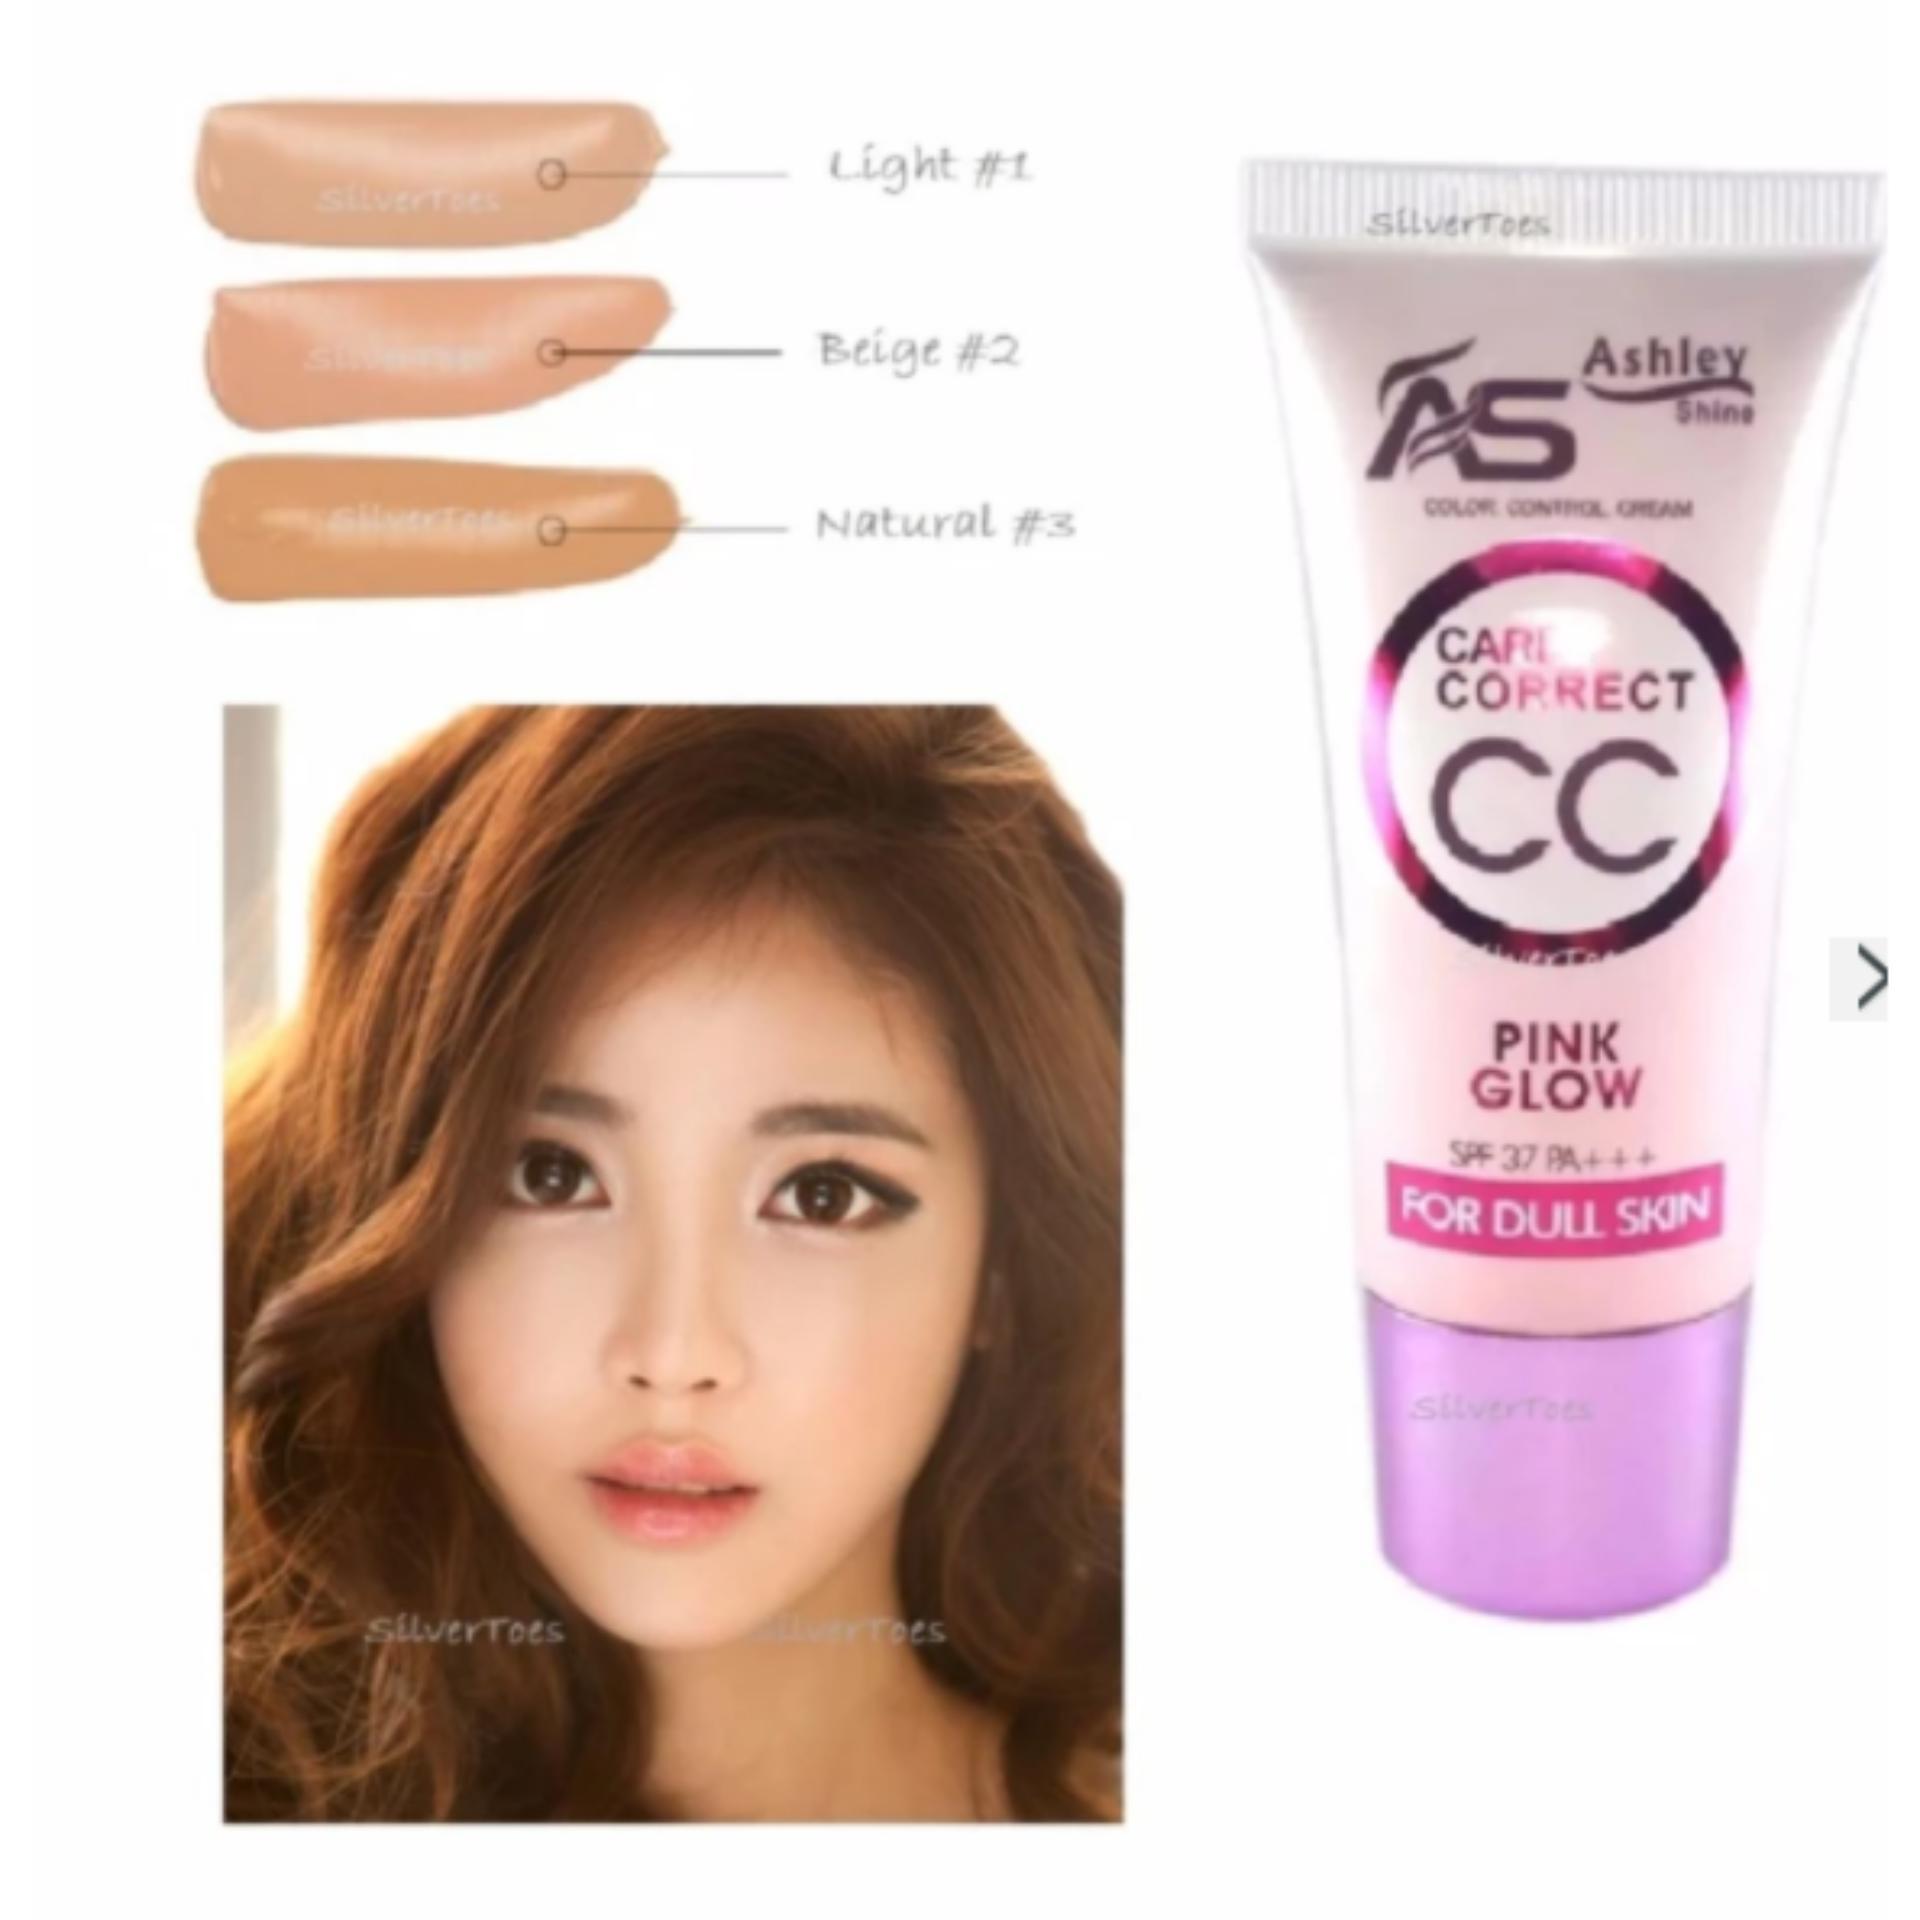 Ashley Shine Care & Correct CC Cream Pink Glow NATURAL #03